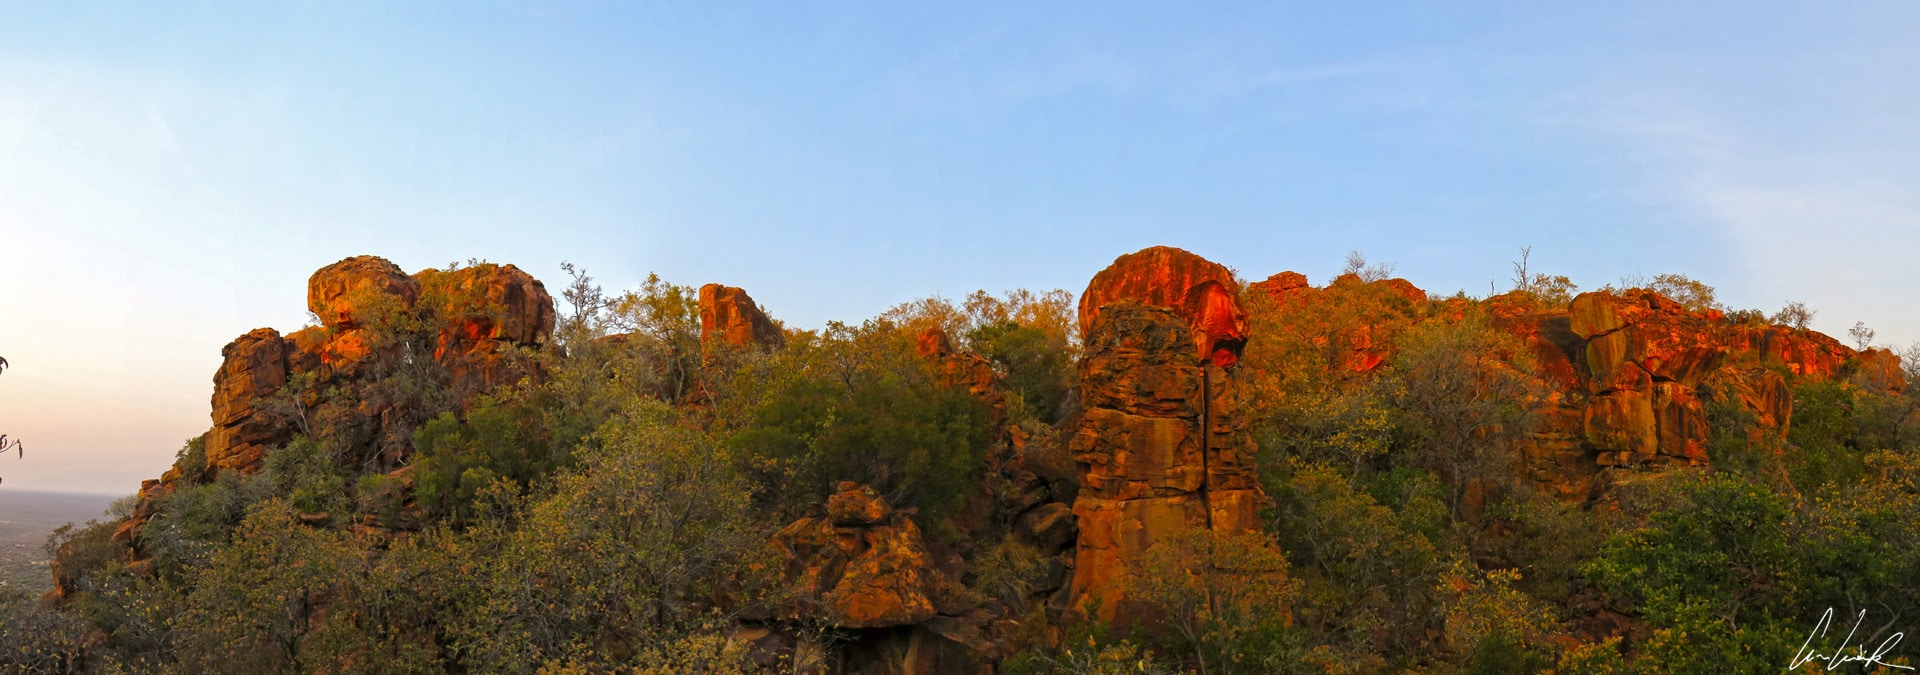 Waterberg Plateau Park !